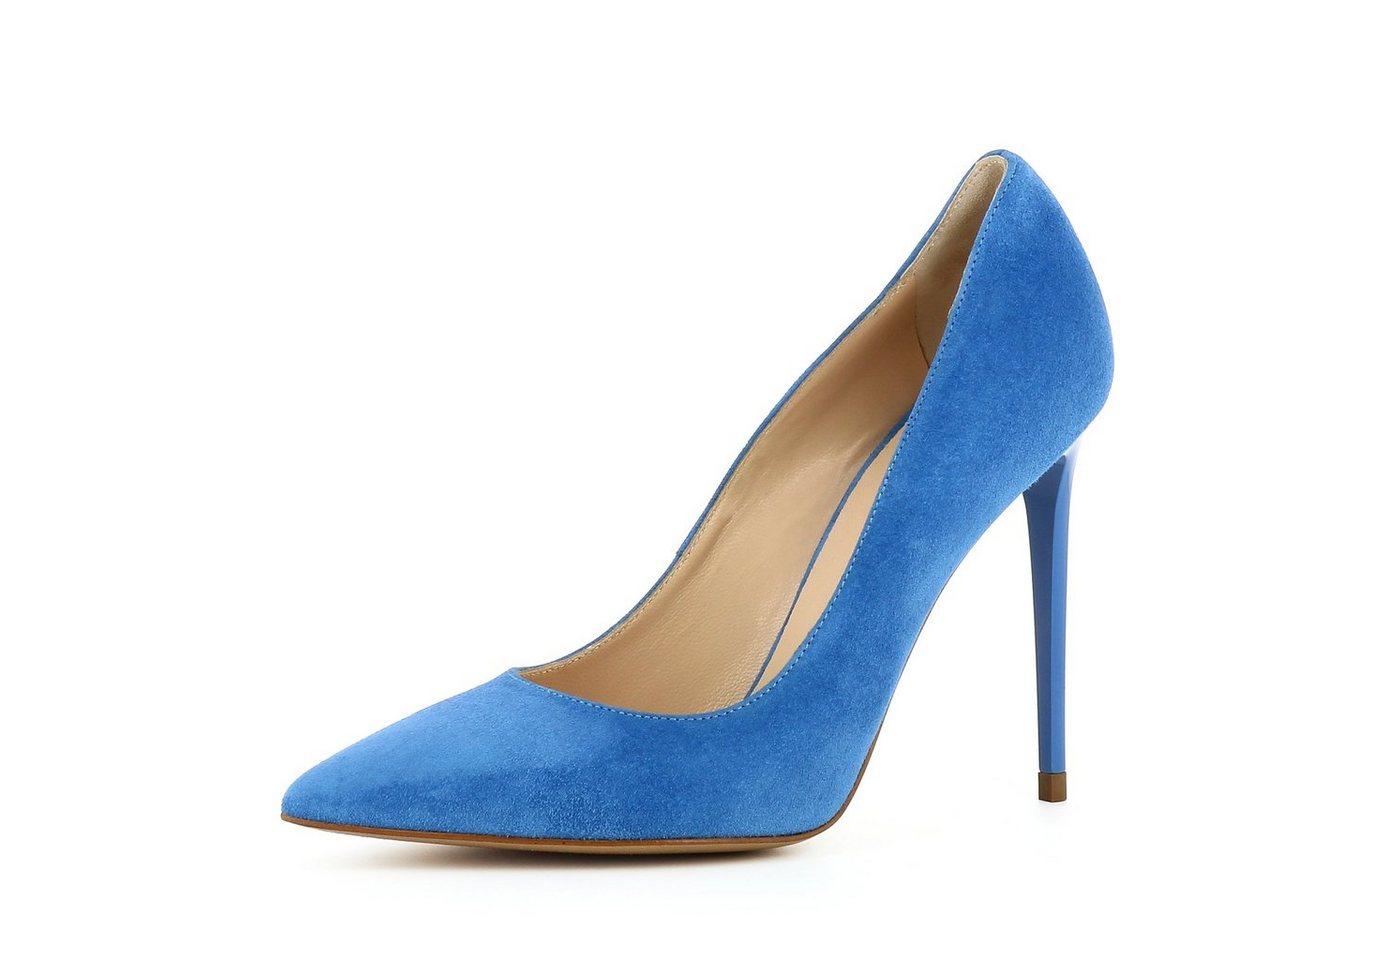 Evita »ALINA« High-Heel-Pumps | Schuhe > High Heels > High Heel Pumps | Blau | Leder | Evita